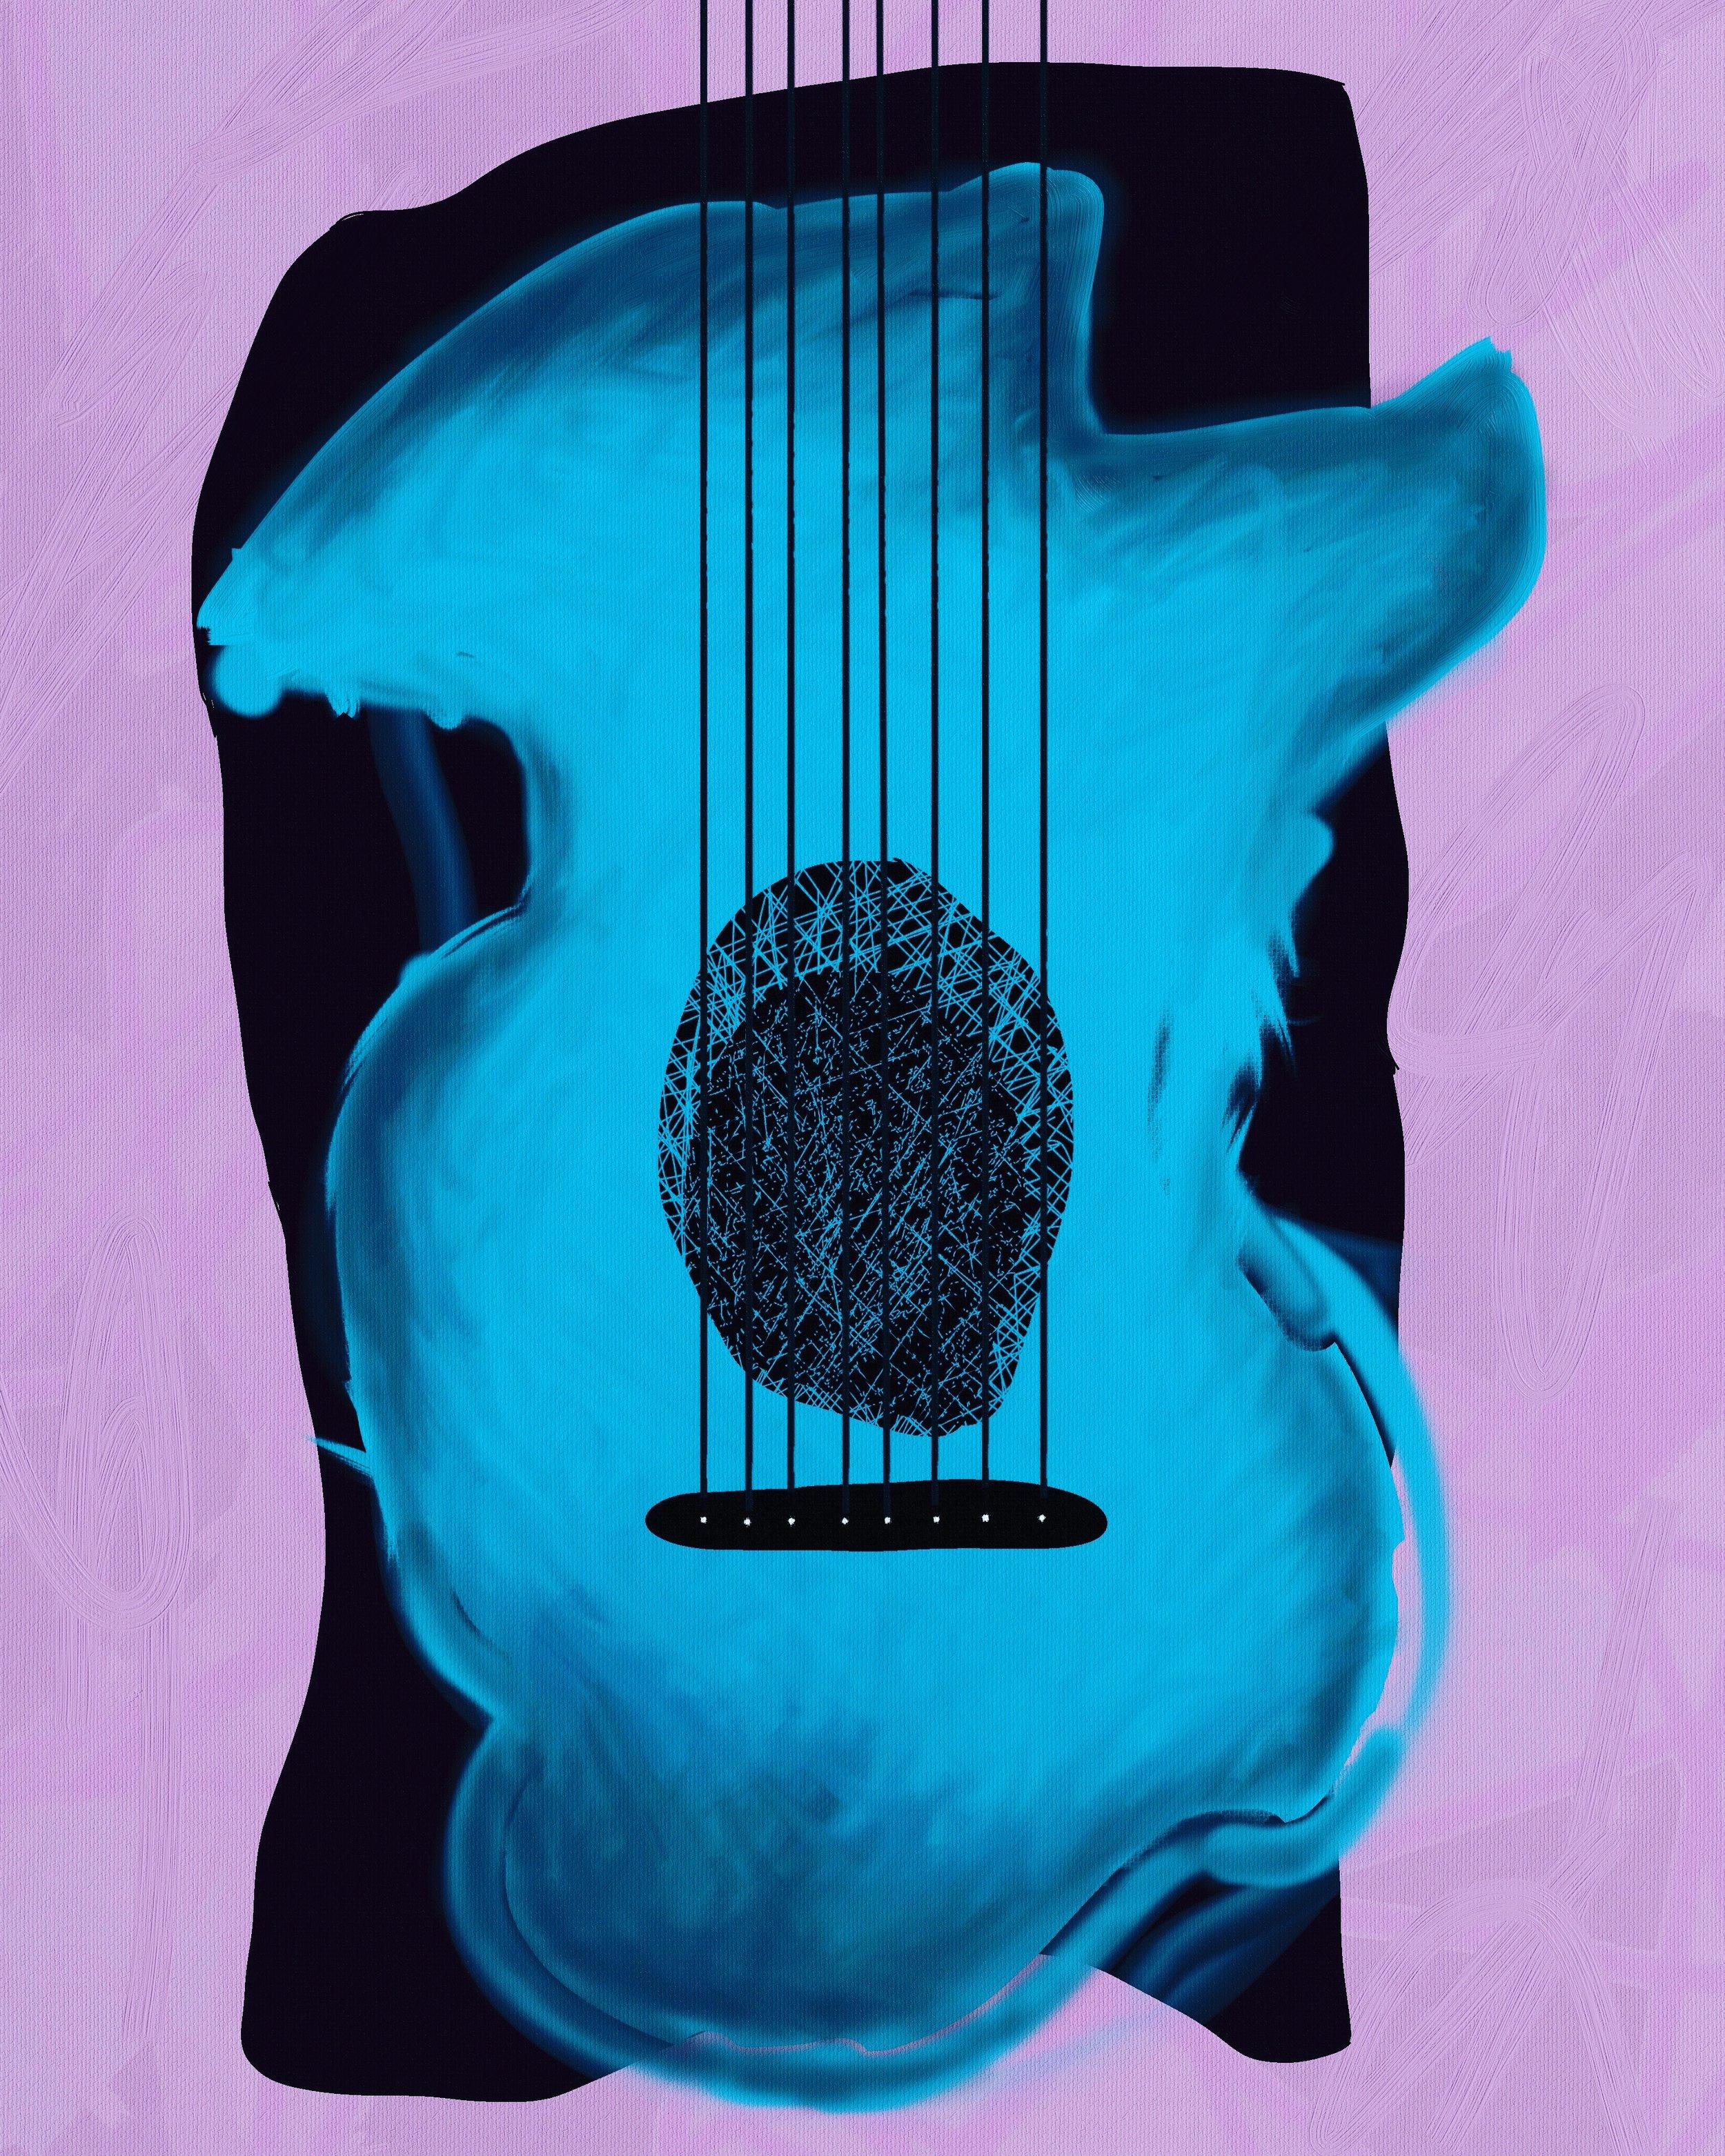 Blue Guitar (2019) iPad creation